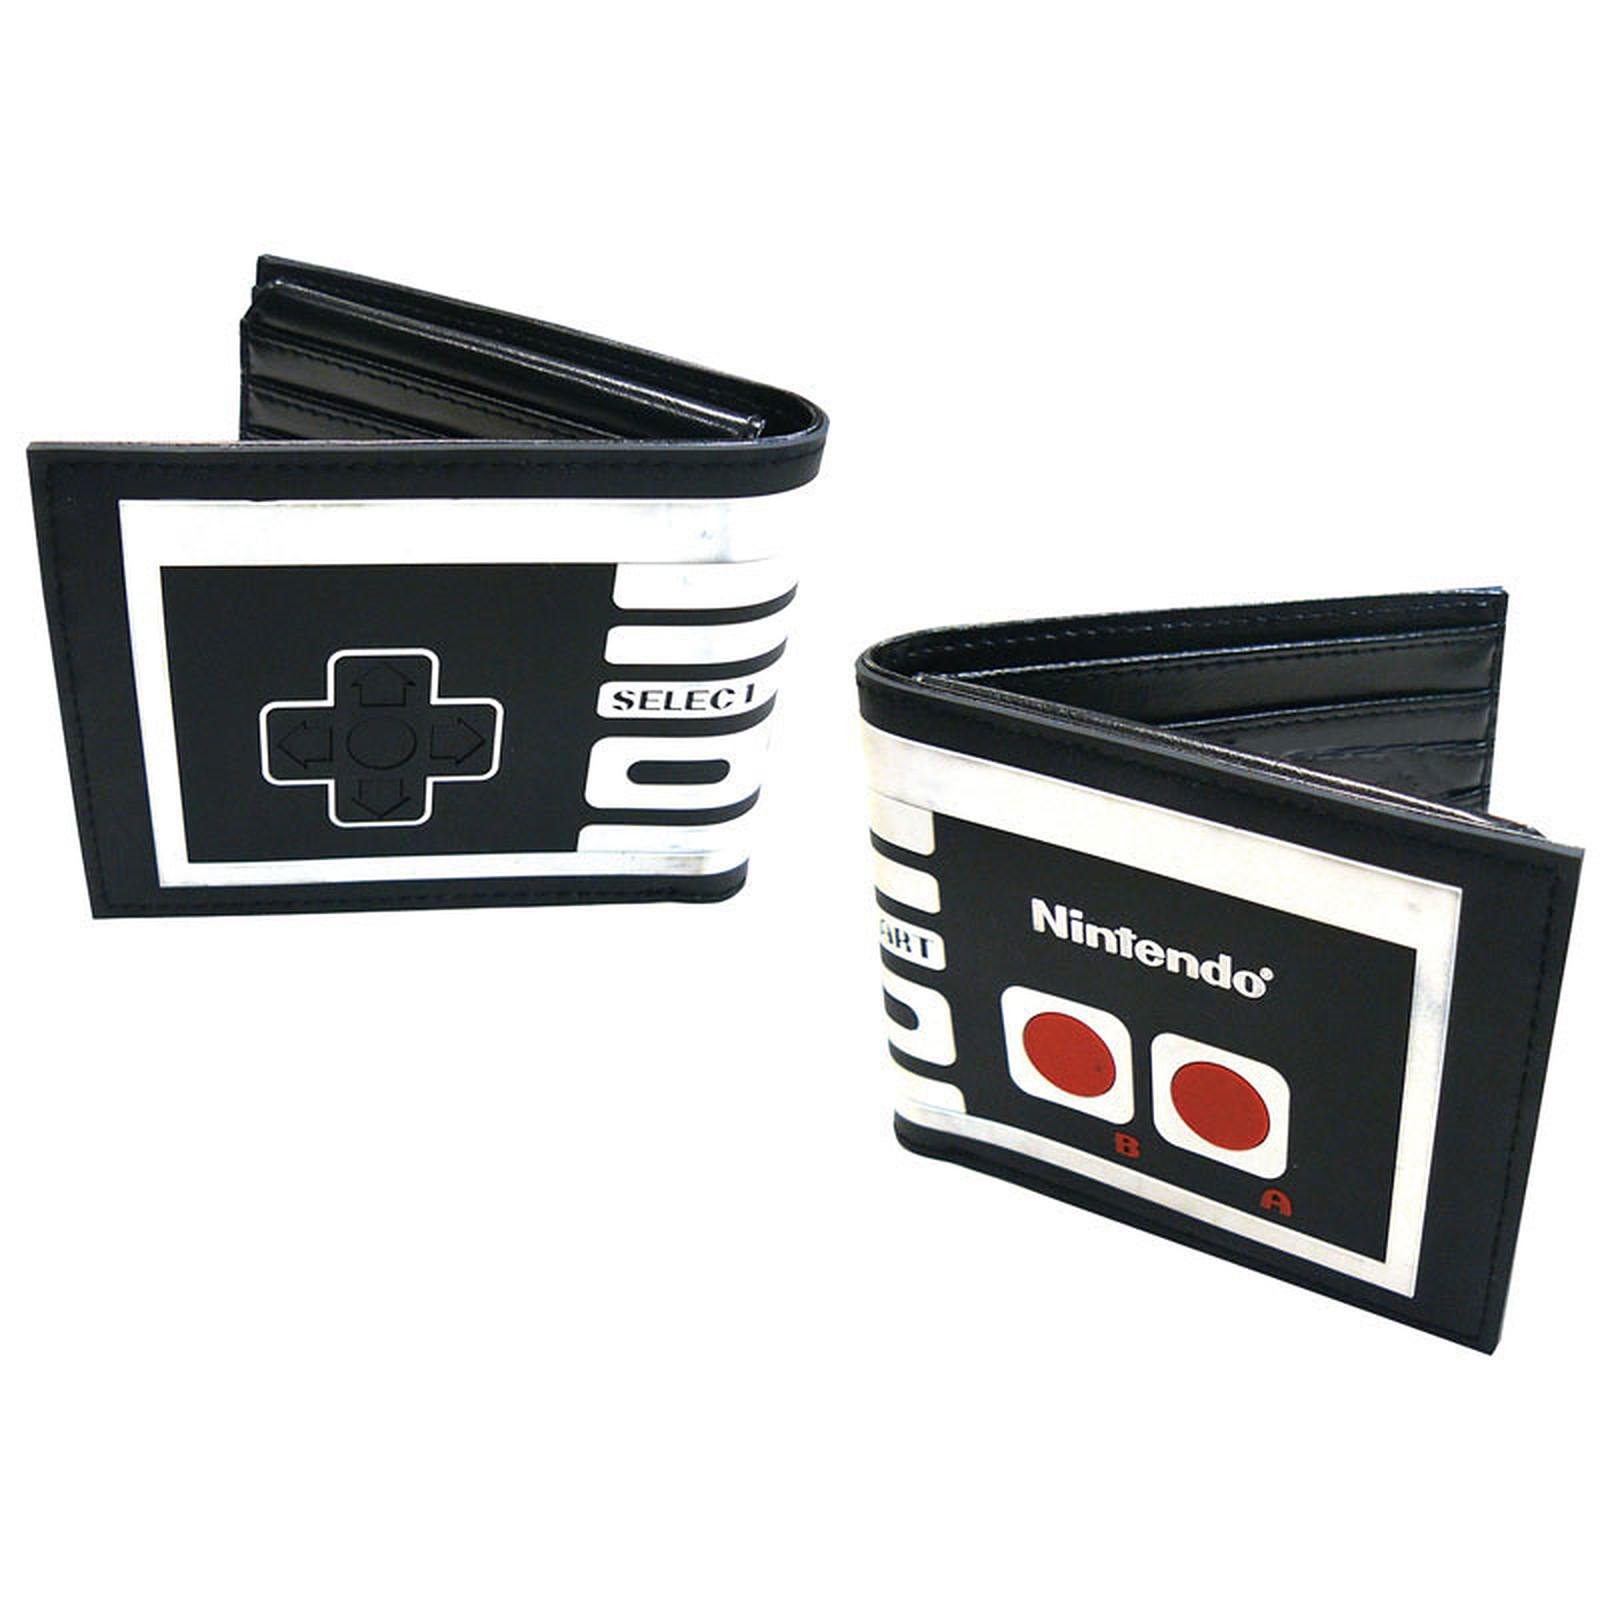 Portefeuille Nintendo NES